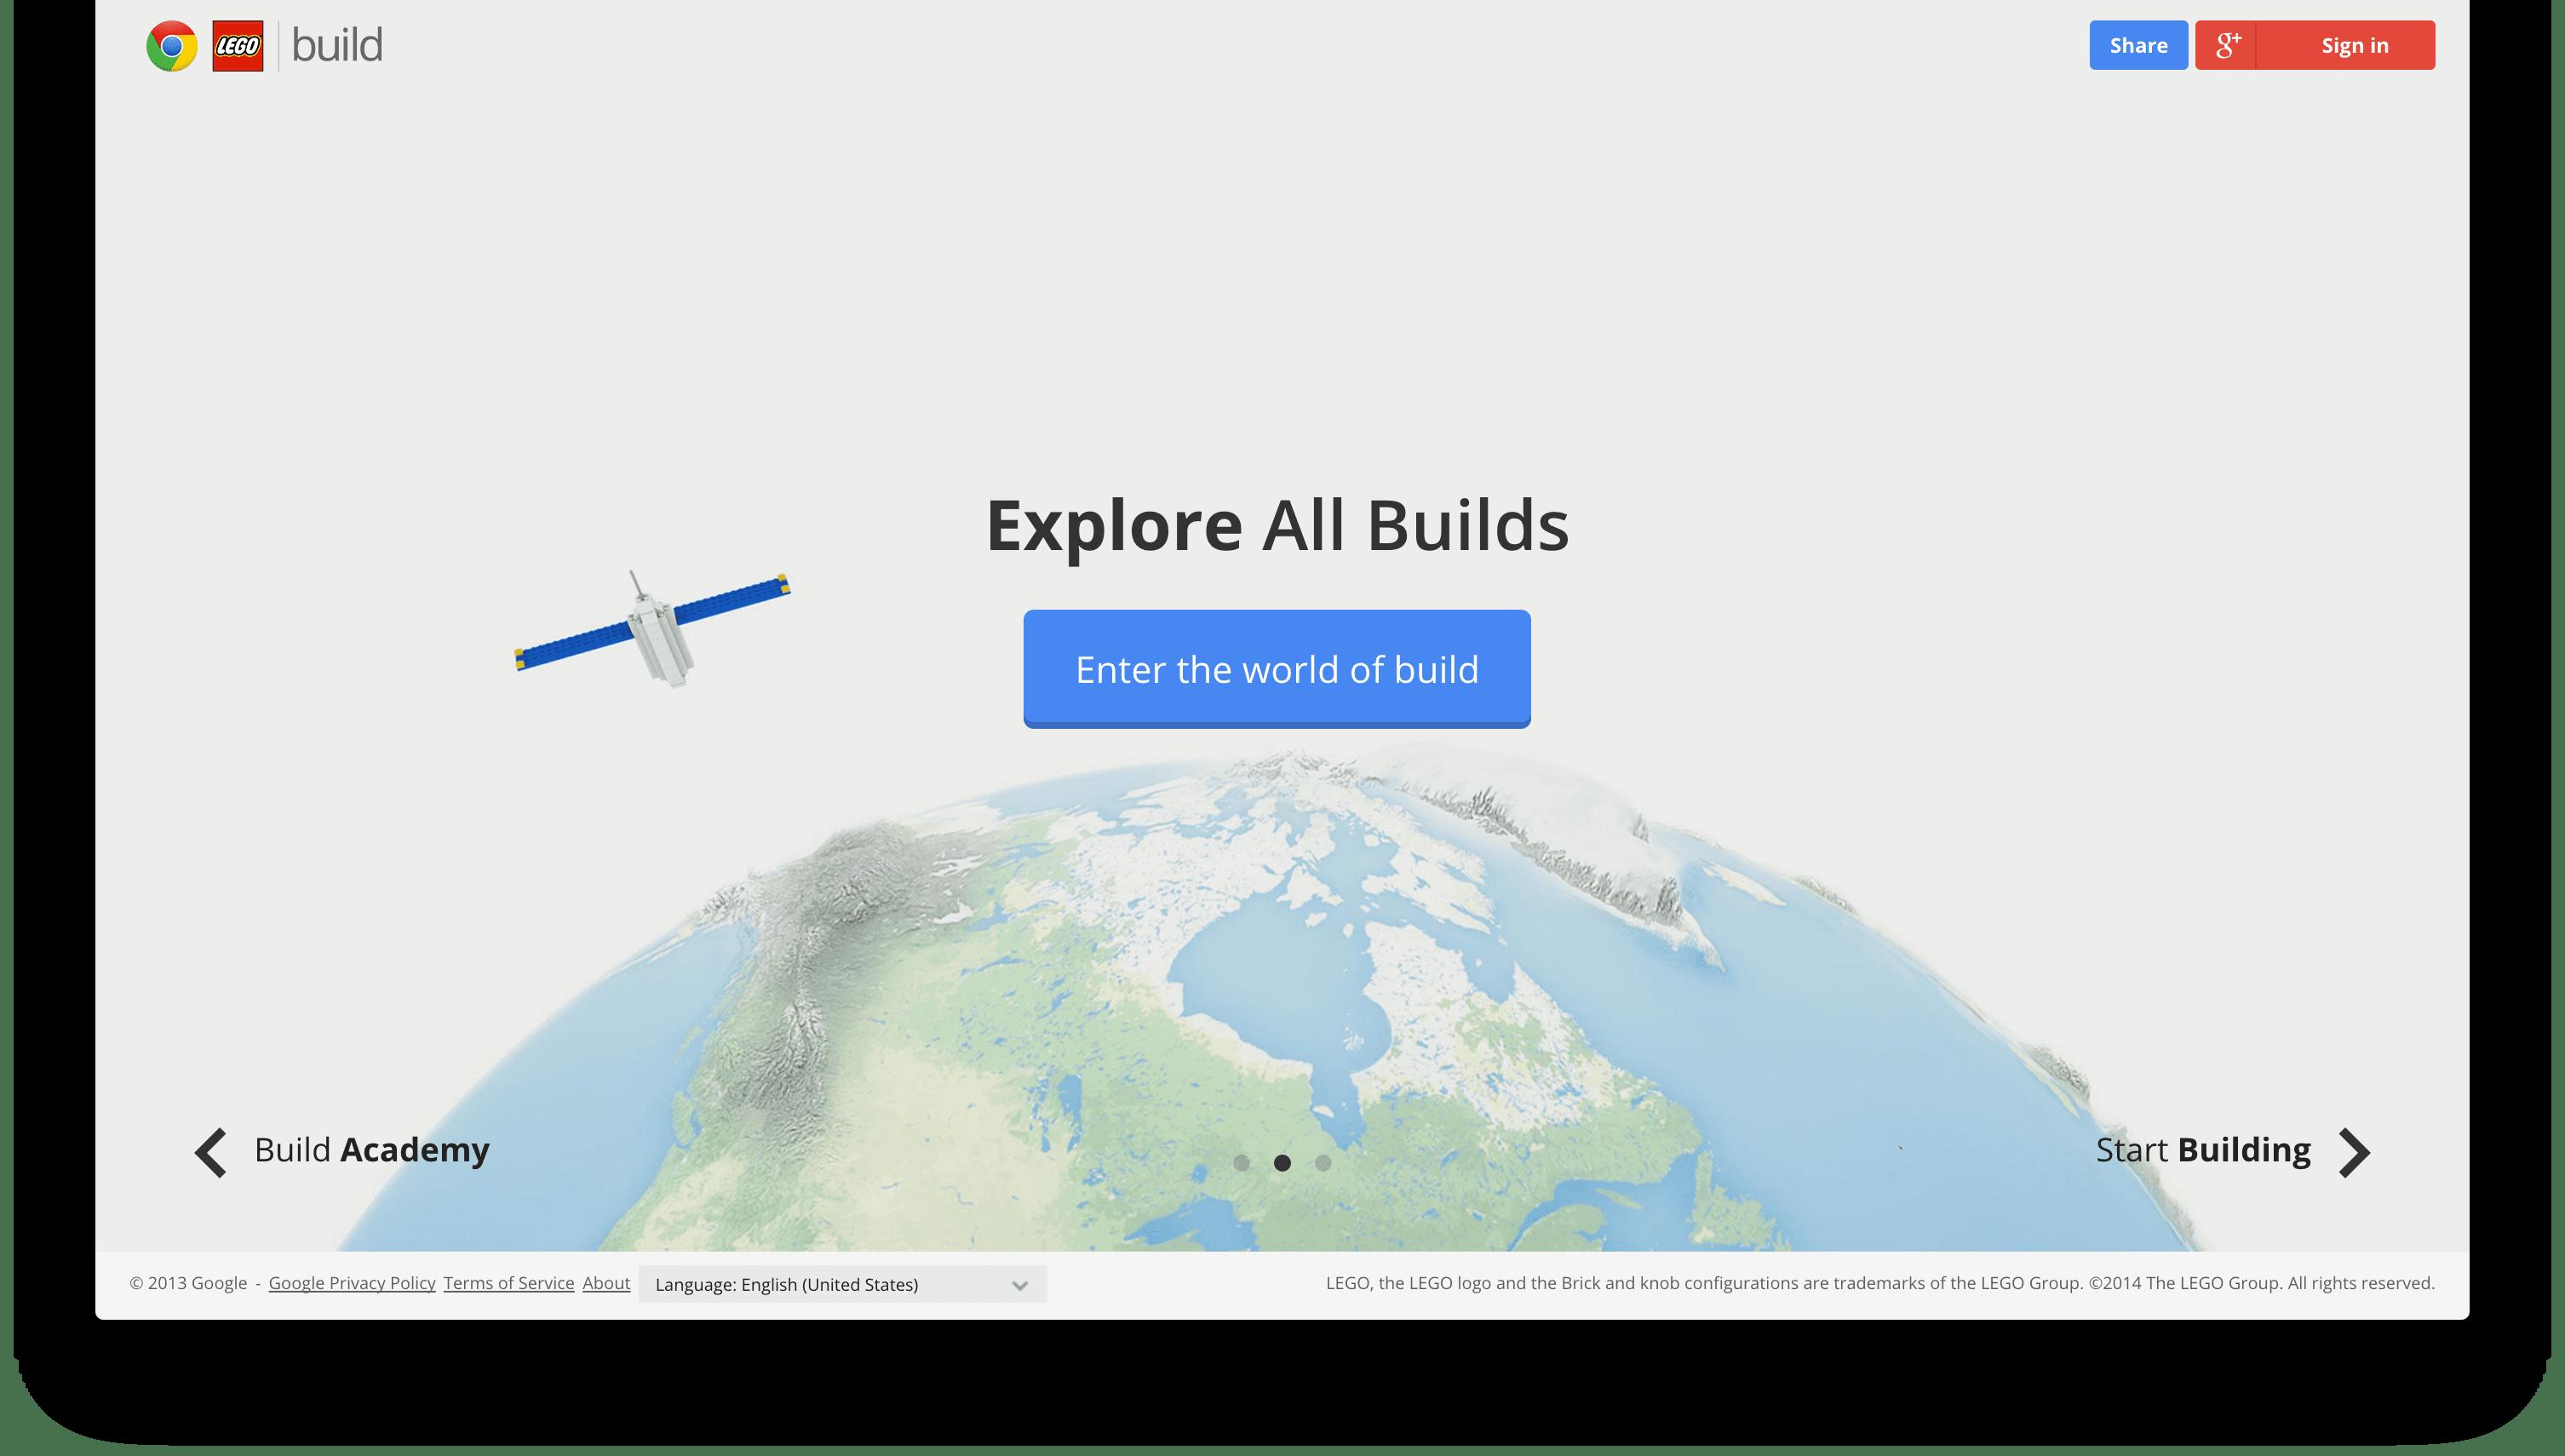 11_BuildWChrome